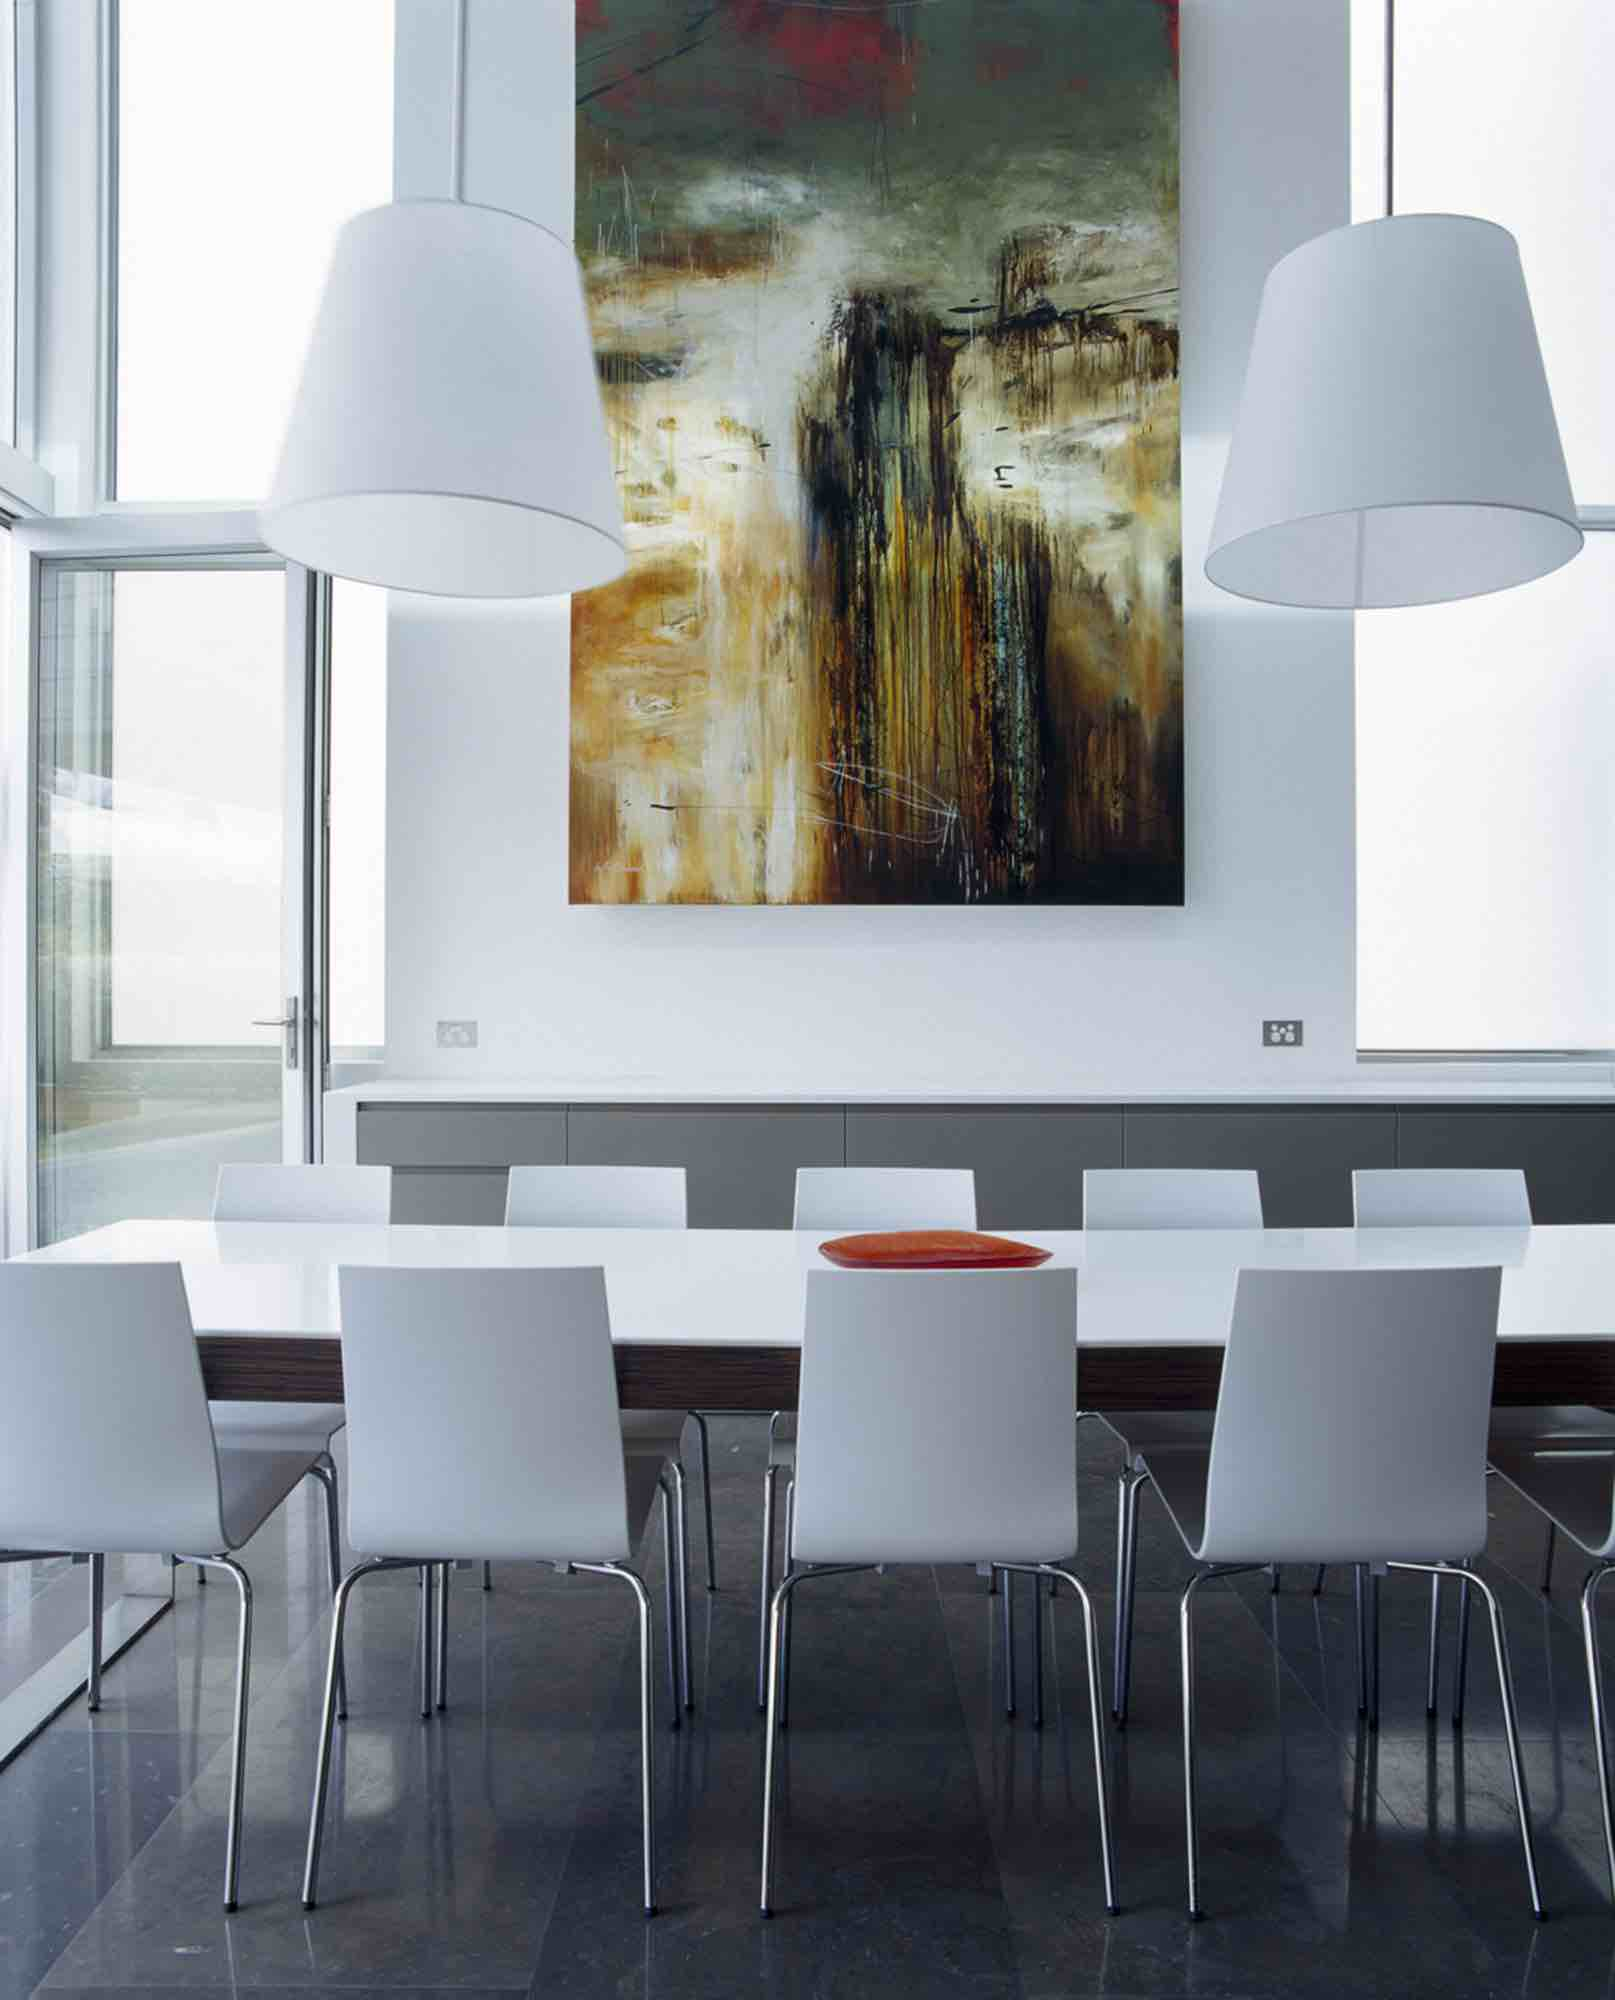 minosa-design-open-plan-high-ceiling-void-large-dinning-table-corian-benchtop-minosa-kitchen-gilda-aquasair-custom-02